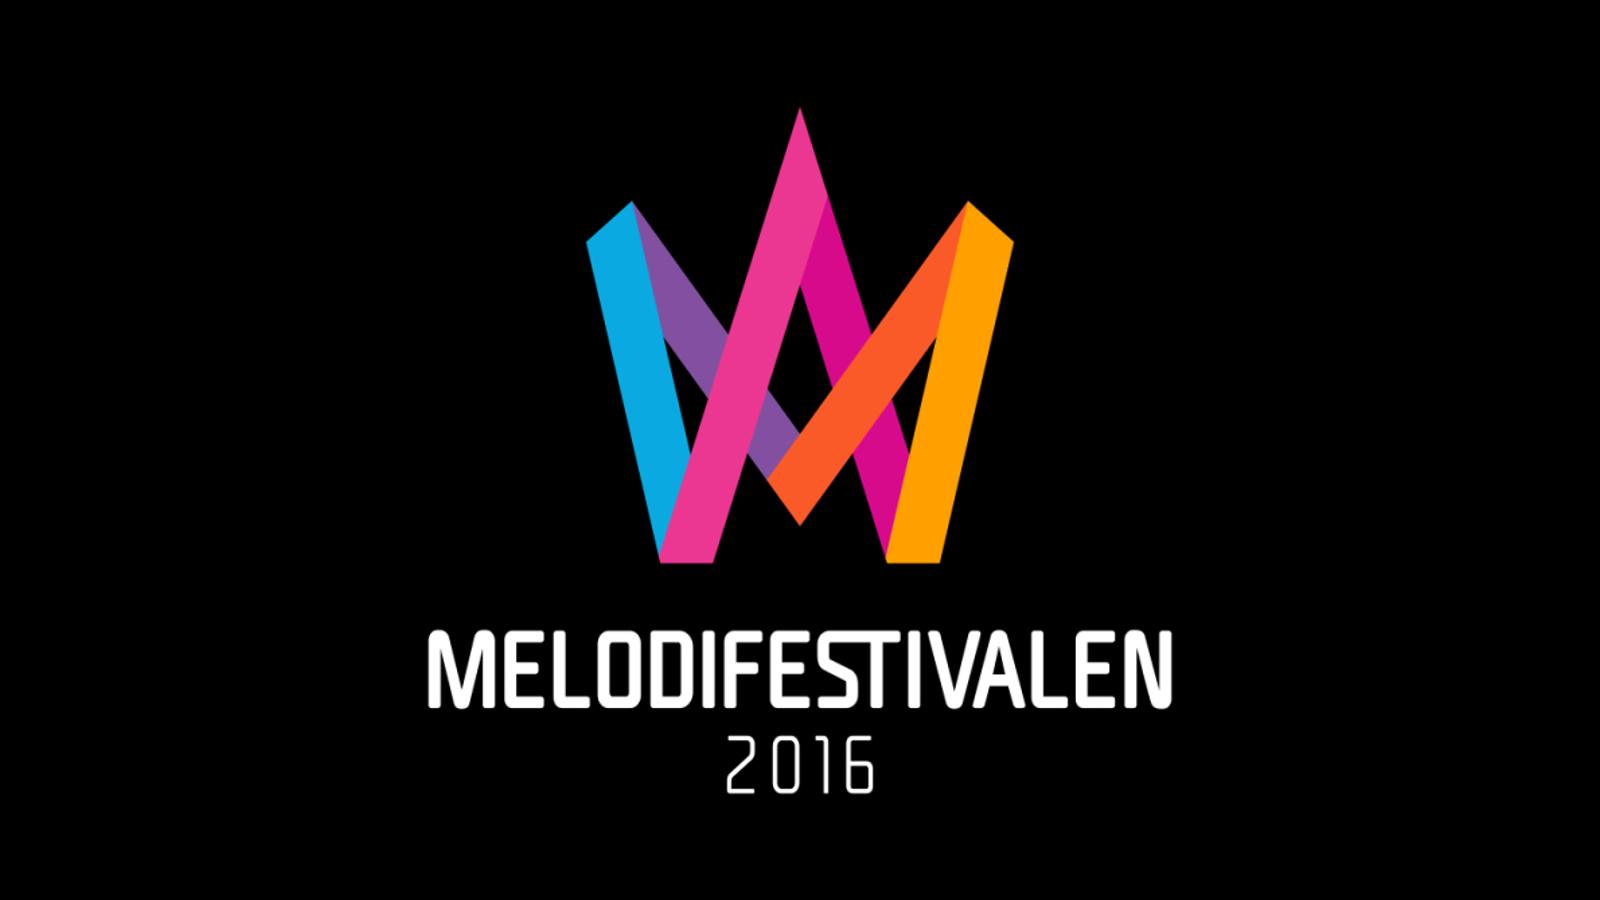 Melodifestivalen-2016.jpg